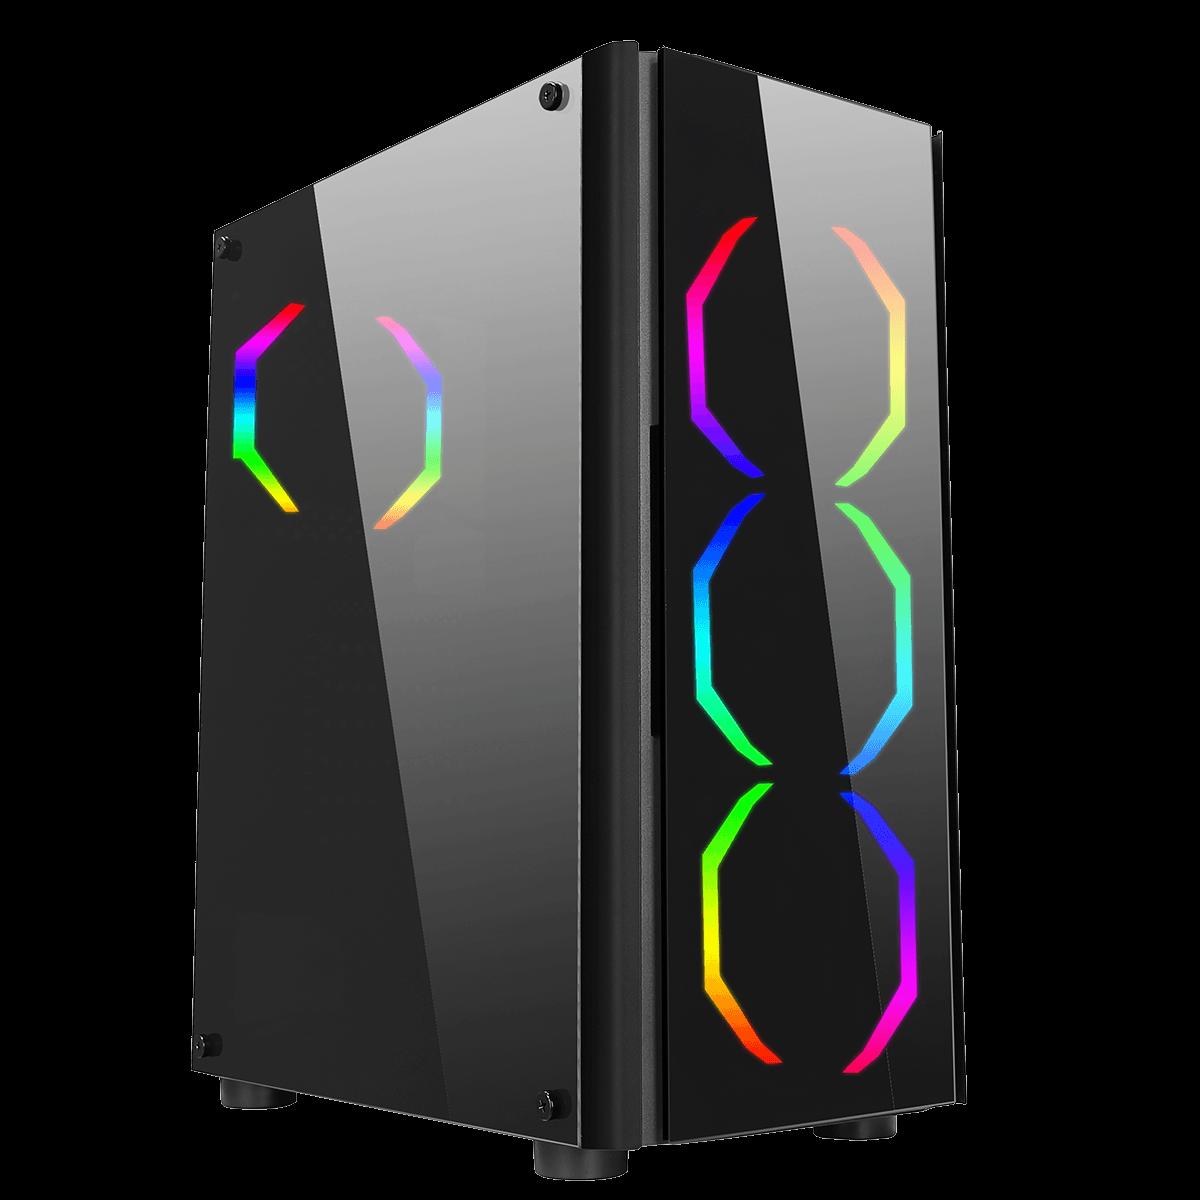 Computador Gamer Infohard AMD Ryzen 5 3600, 8GB DDR4, 500GB SSD, GTX1050TI 4GB, 550W, B450M - 635893